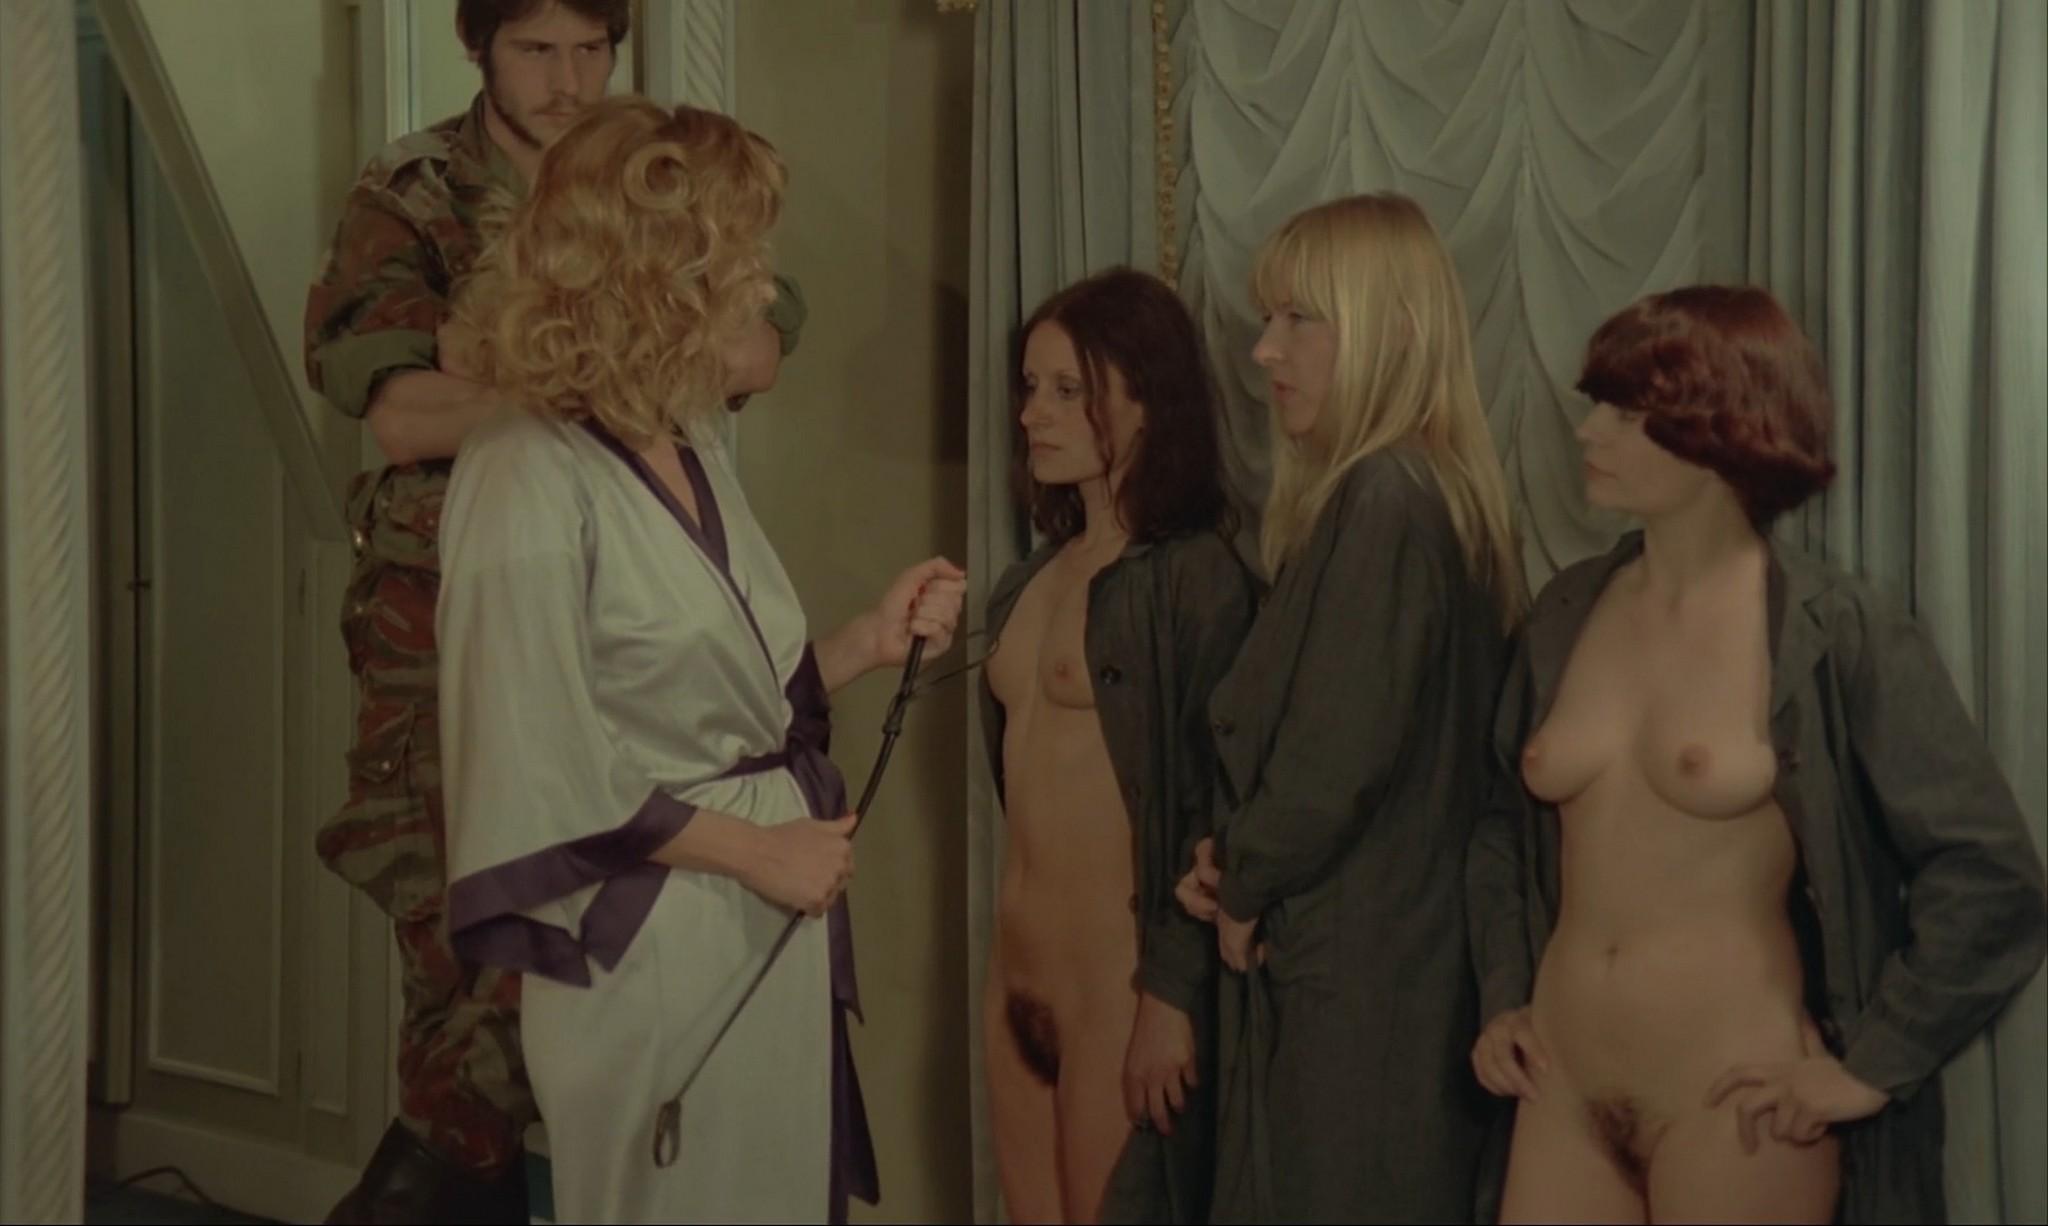 Malisa Longo nude full frontal Patrizia Gori and others nude too Helga la louve de Stilberg 1978 1080p BluRay 9